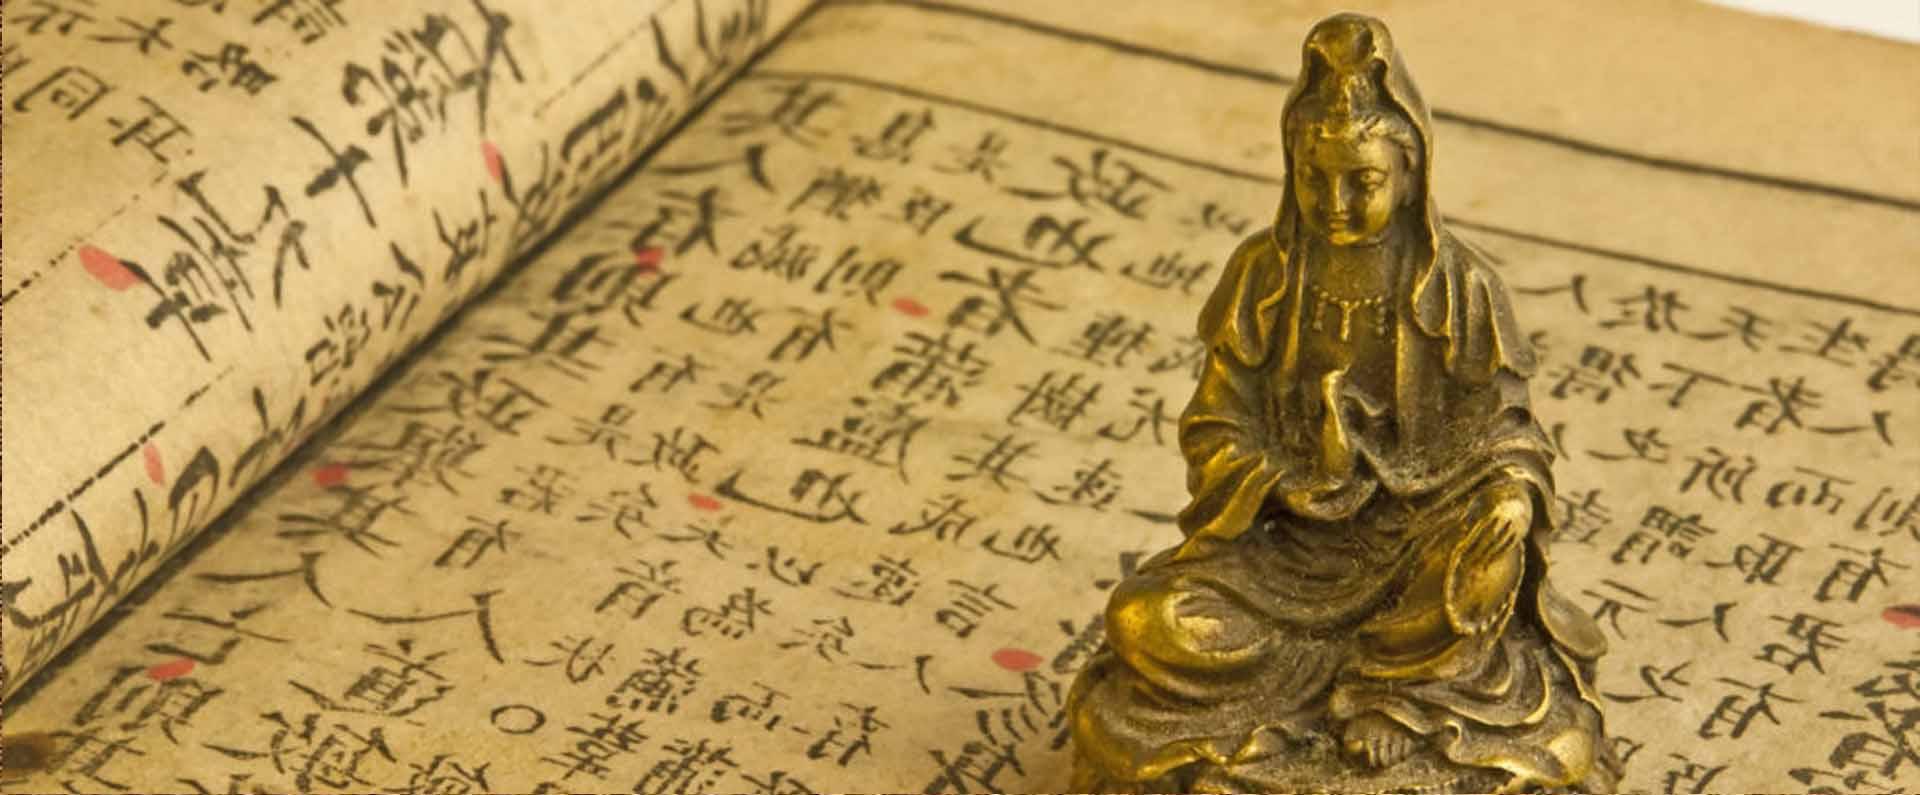 libro antico cinese topbig